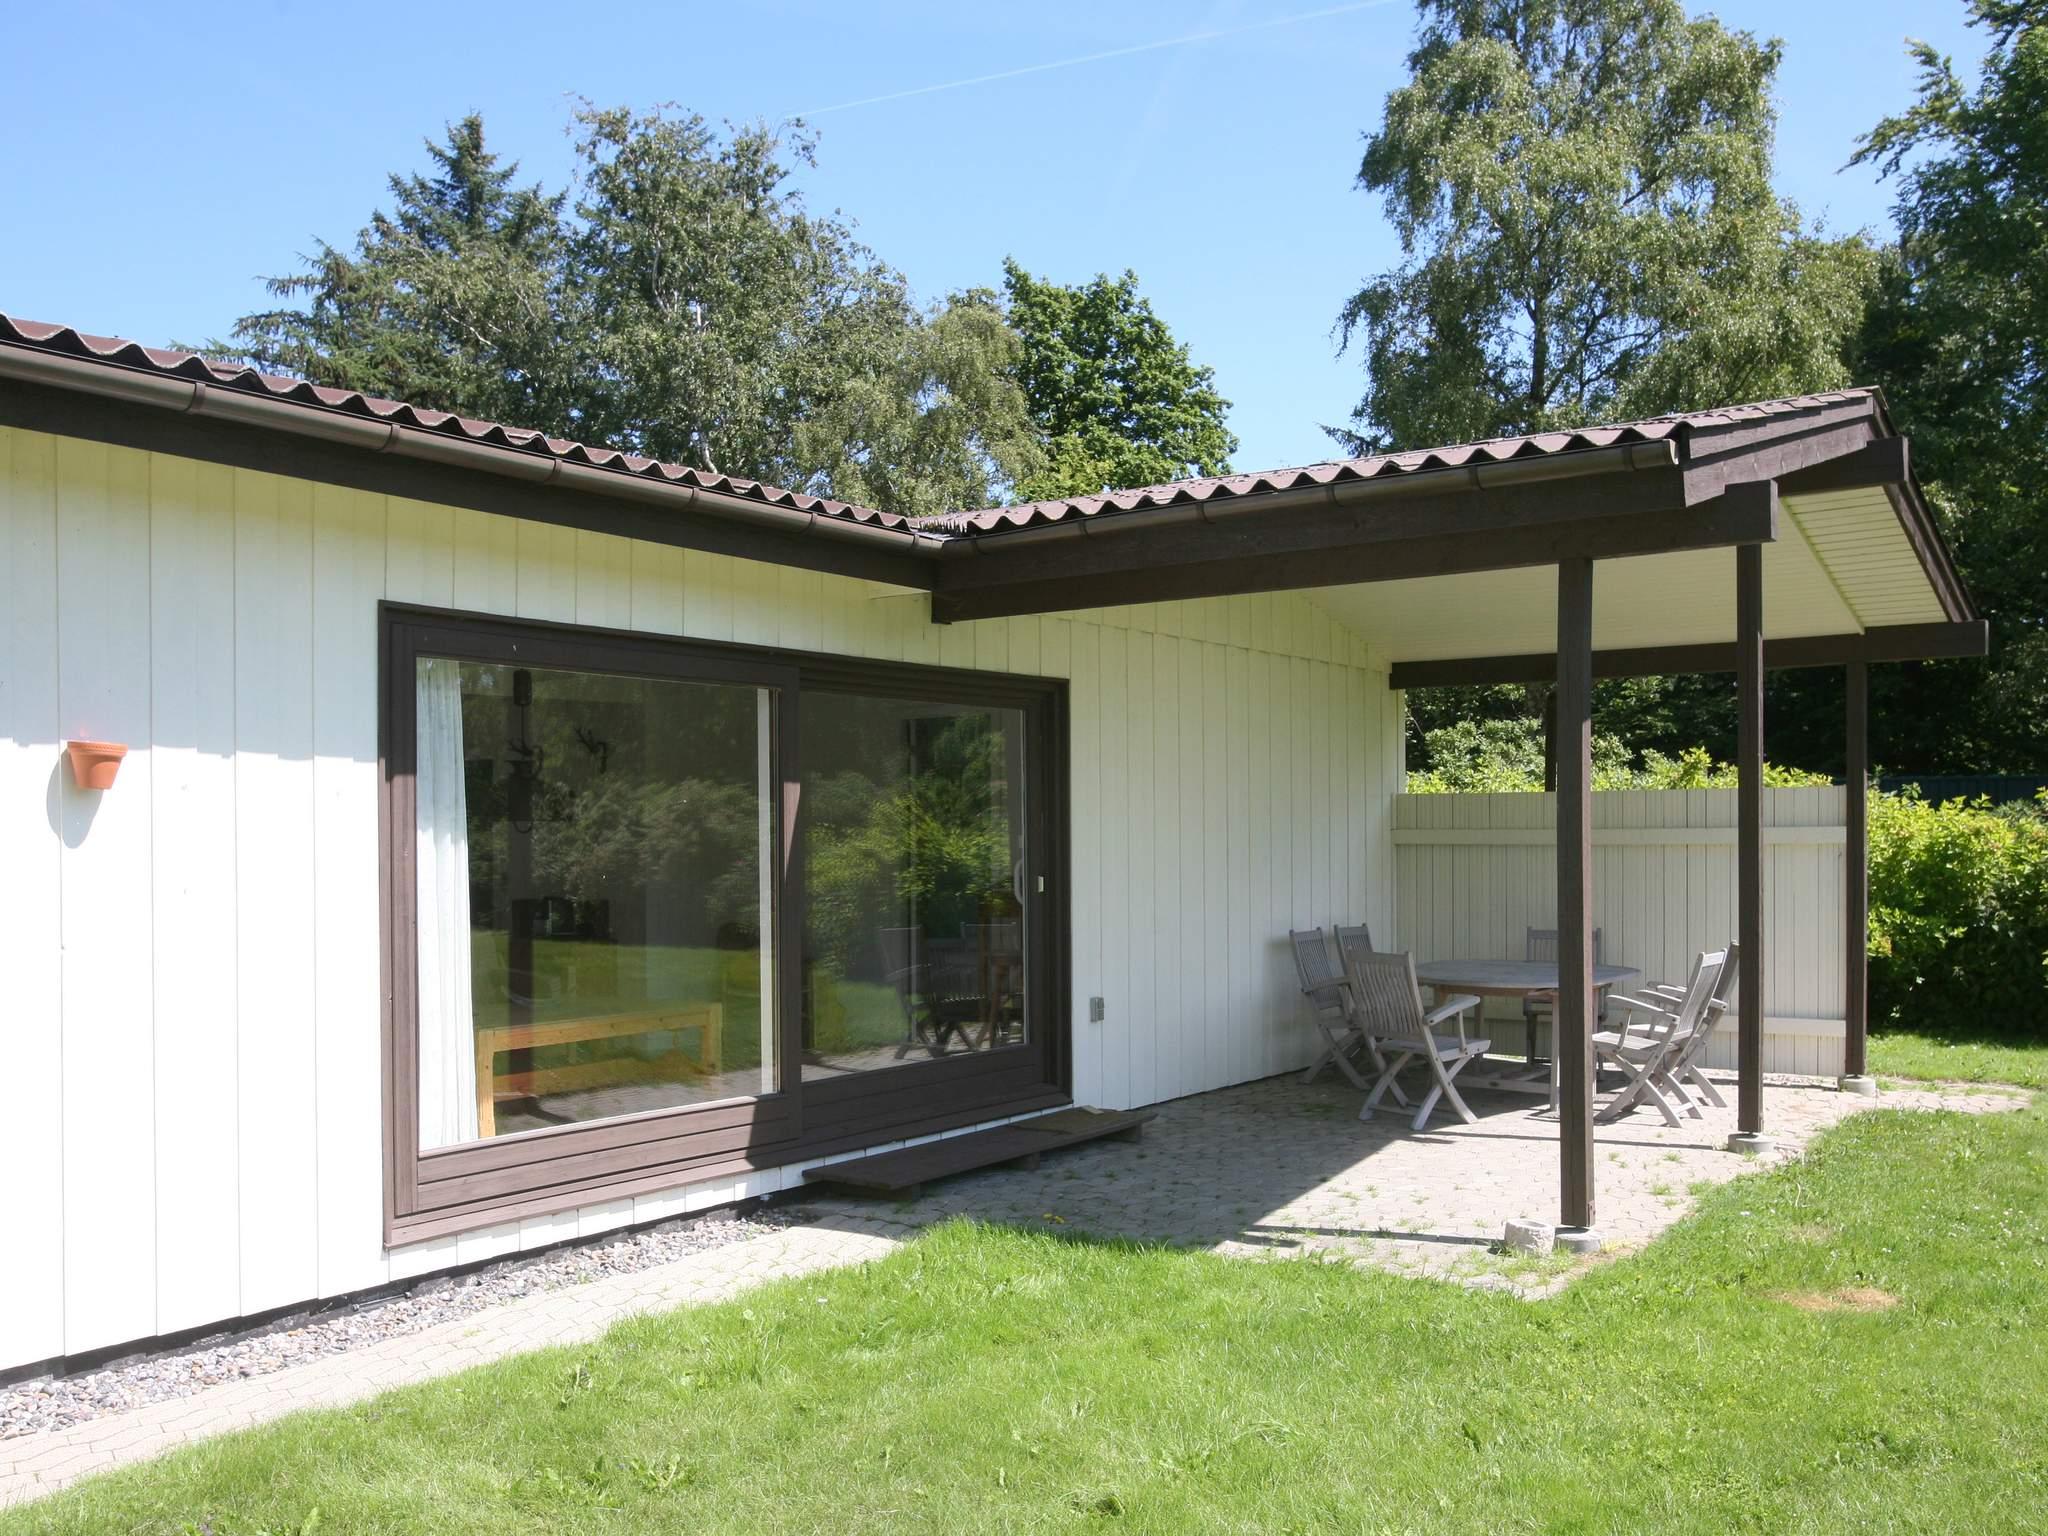 Ferienhaus Faxe Ladeplads (251691), Fakse Ladeplads, , Südseeland, Dänemark, Bild 14